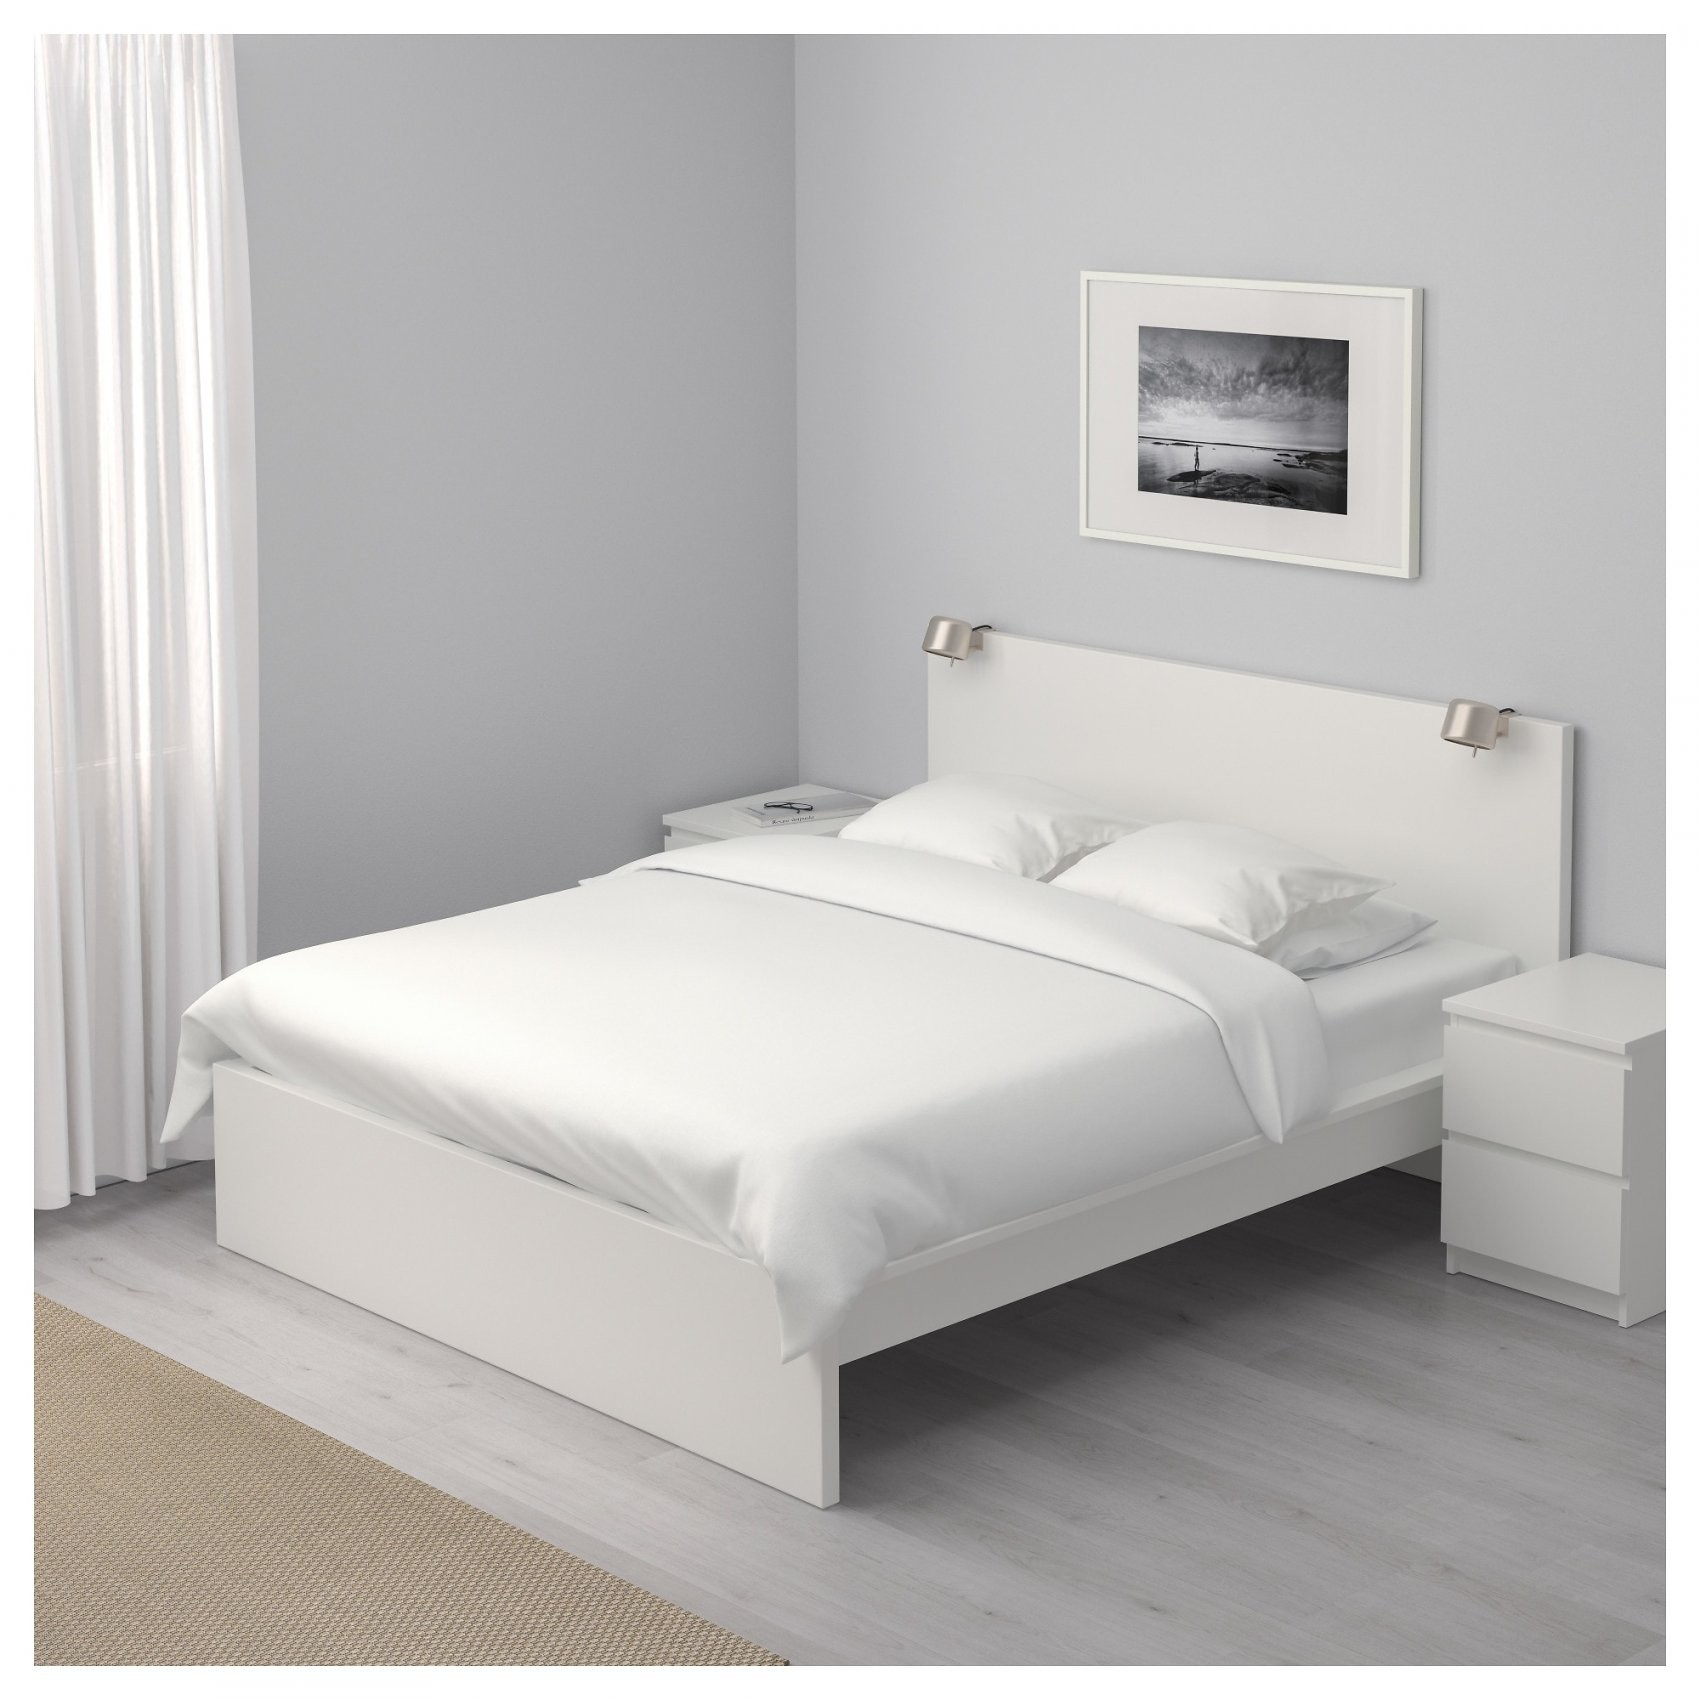 Malm Bettgestell Hoch  140X200 Cm  Weiß  Ikea von Ikea Malm Bett 140X200 Weiß Photo